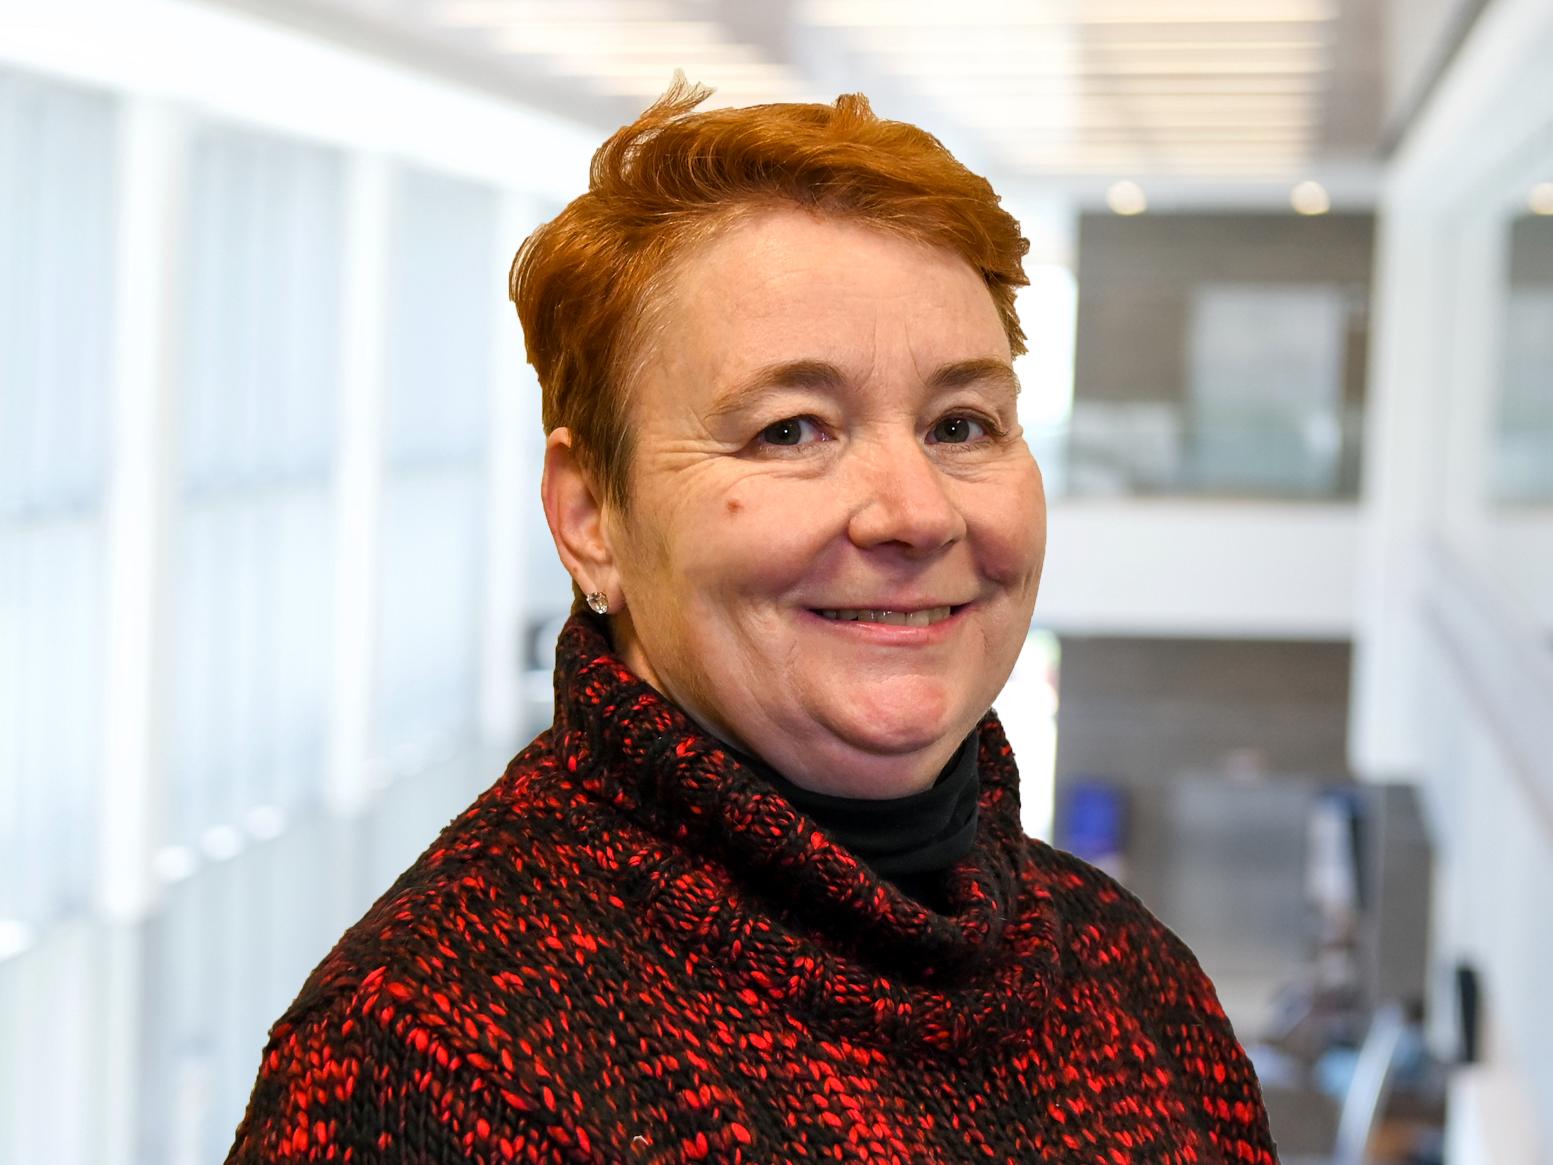 Dr. Nicolette Caccia